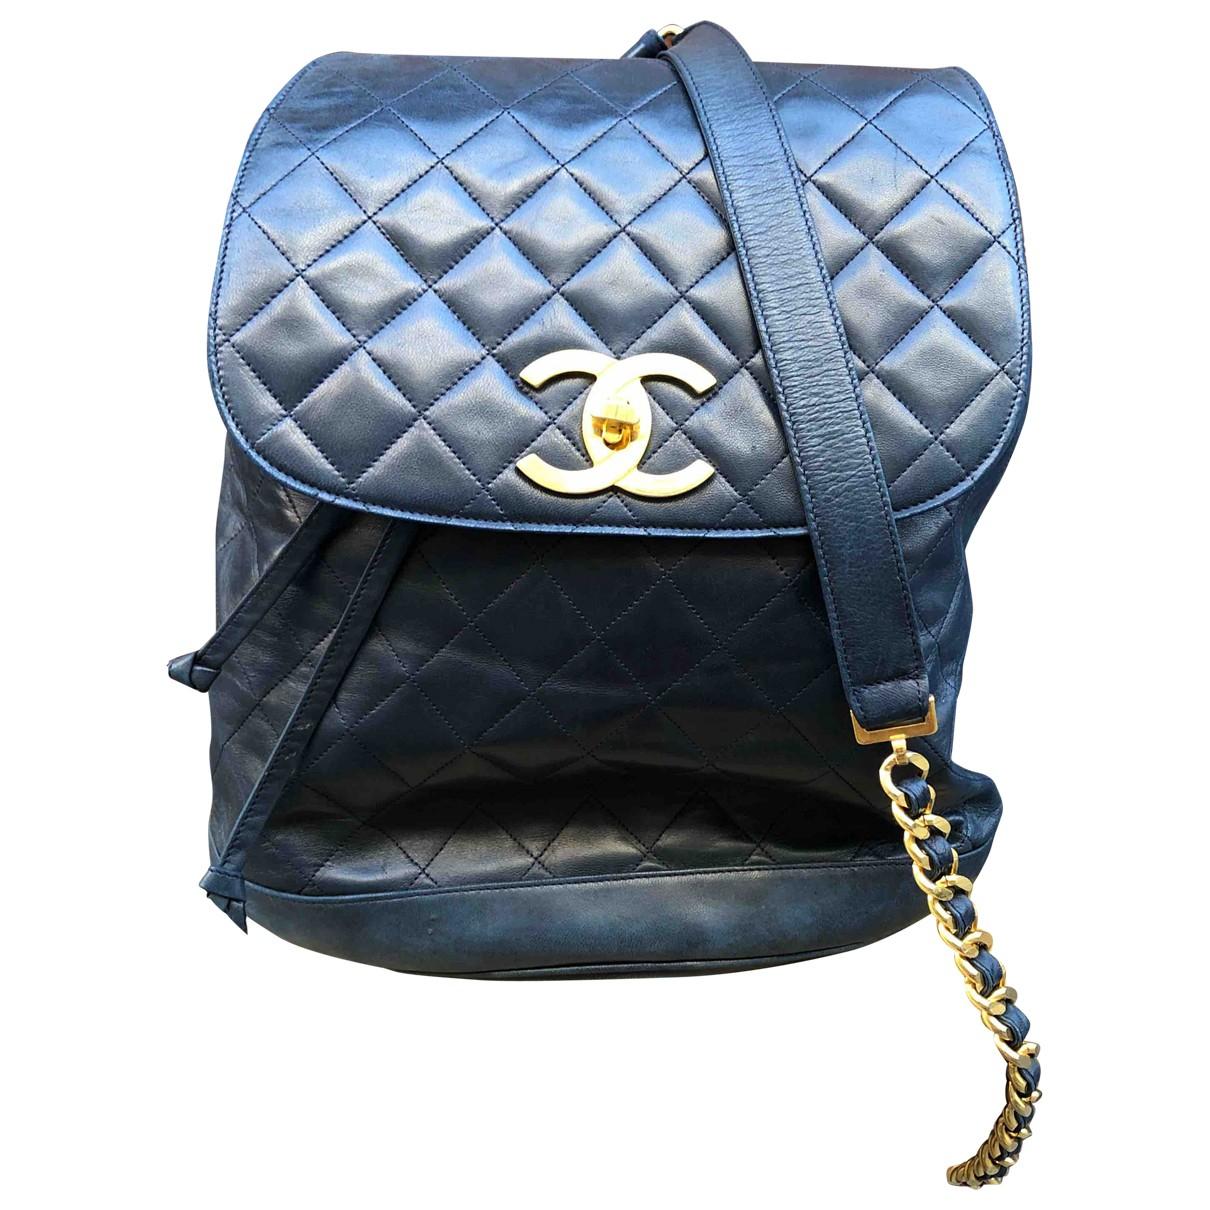 Mochila Timeless/Classique de Cuero Chanel